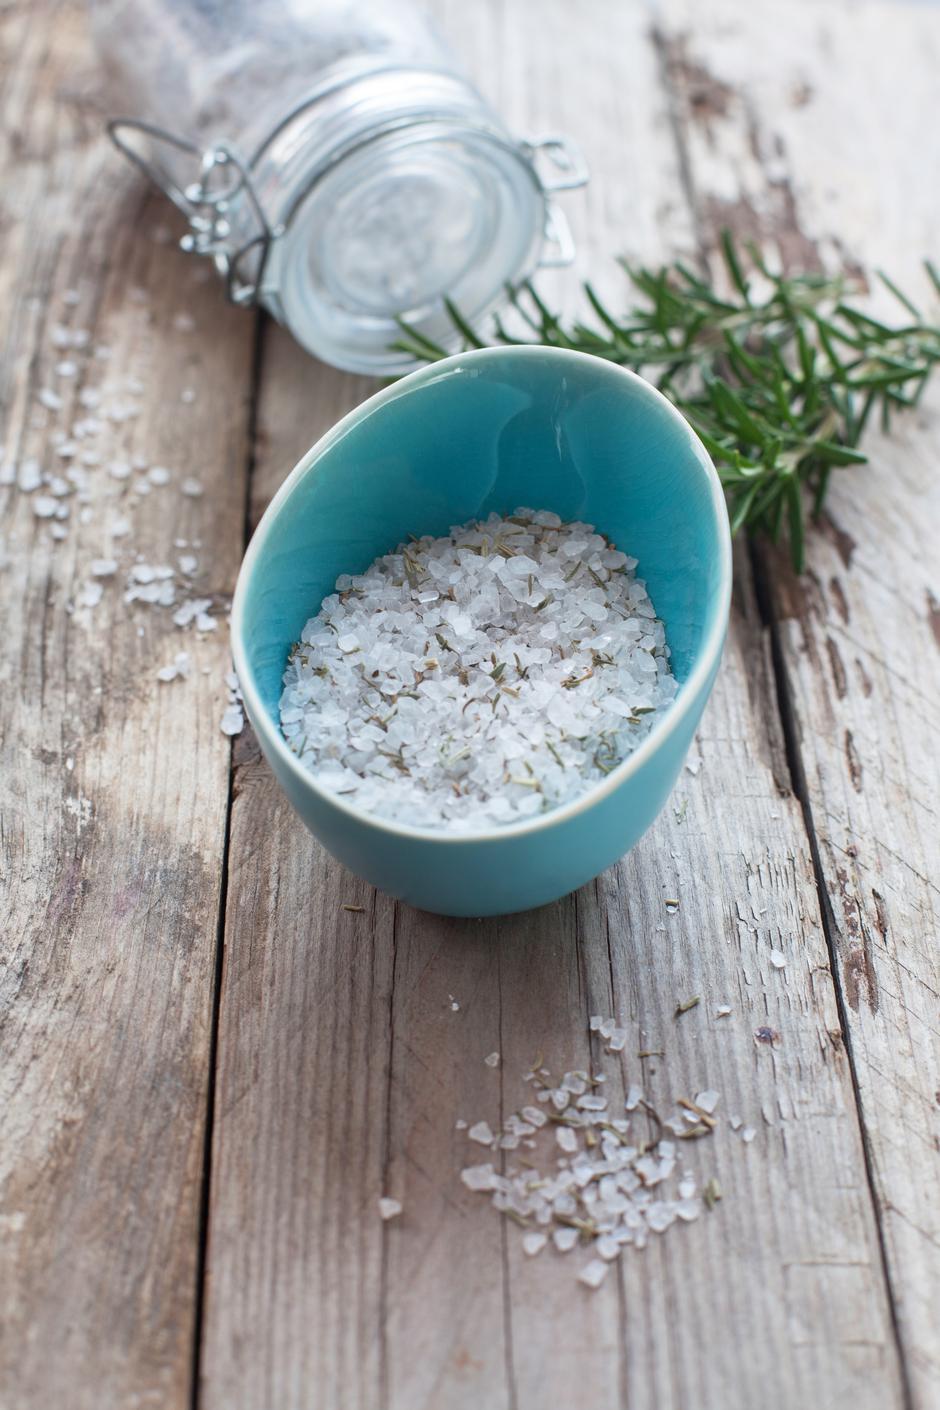 Homemade rosemary sea salt | Autor: Photographer: Natalie Barth